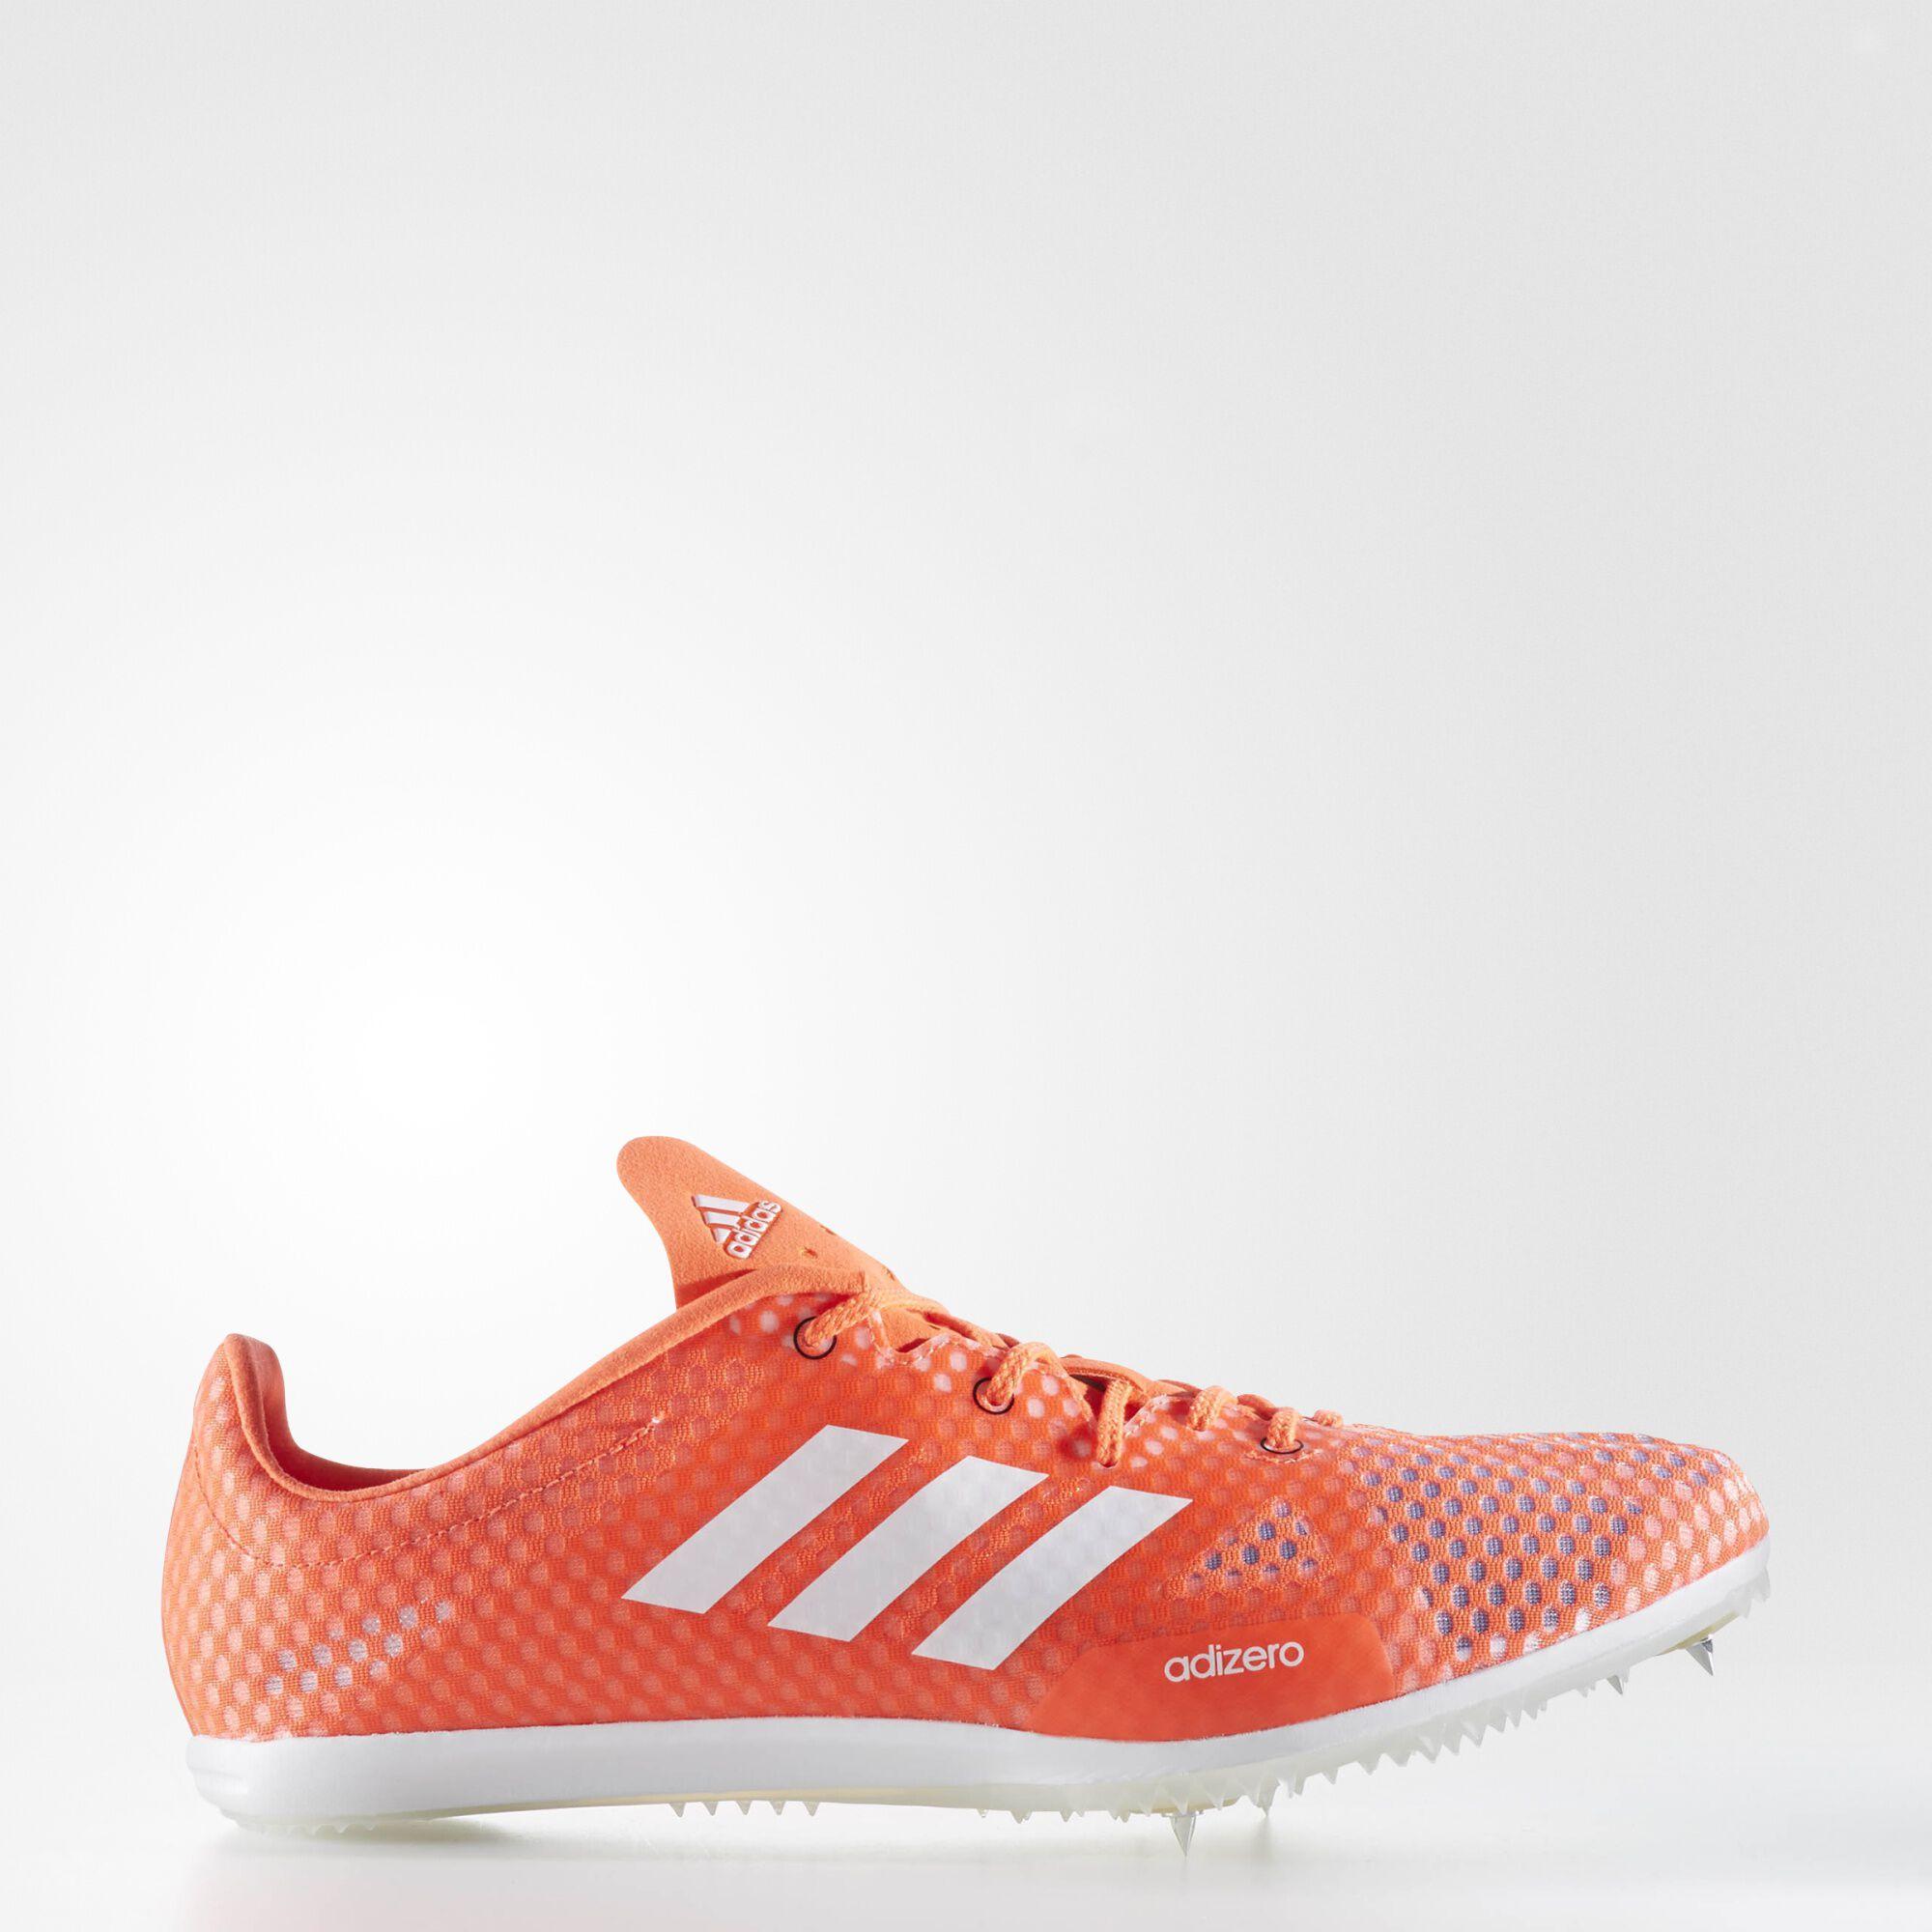 adidas ultra boost sale, Adidas Uk Easy Travel US Adizero